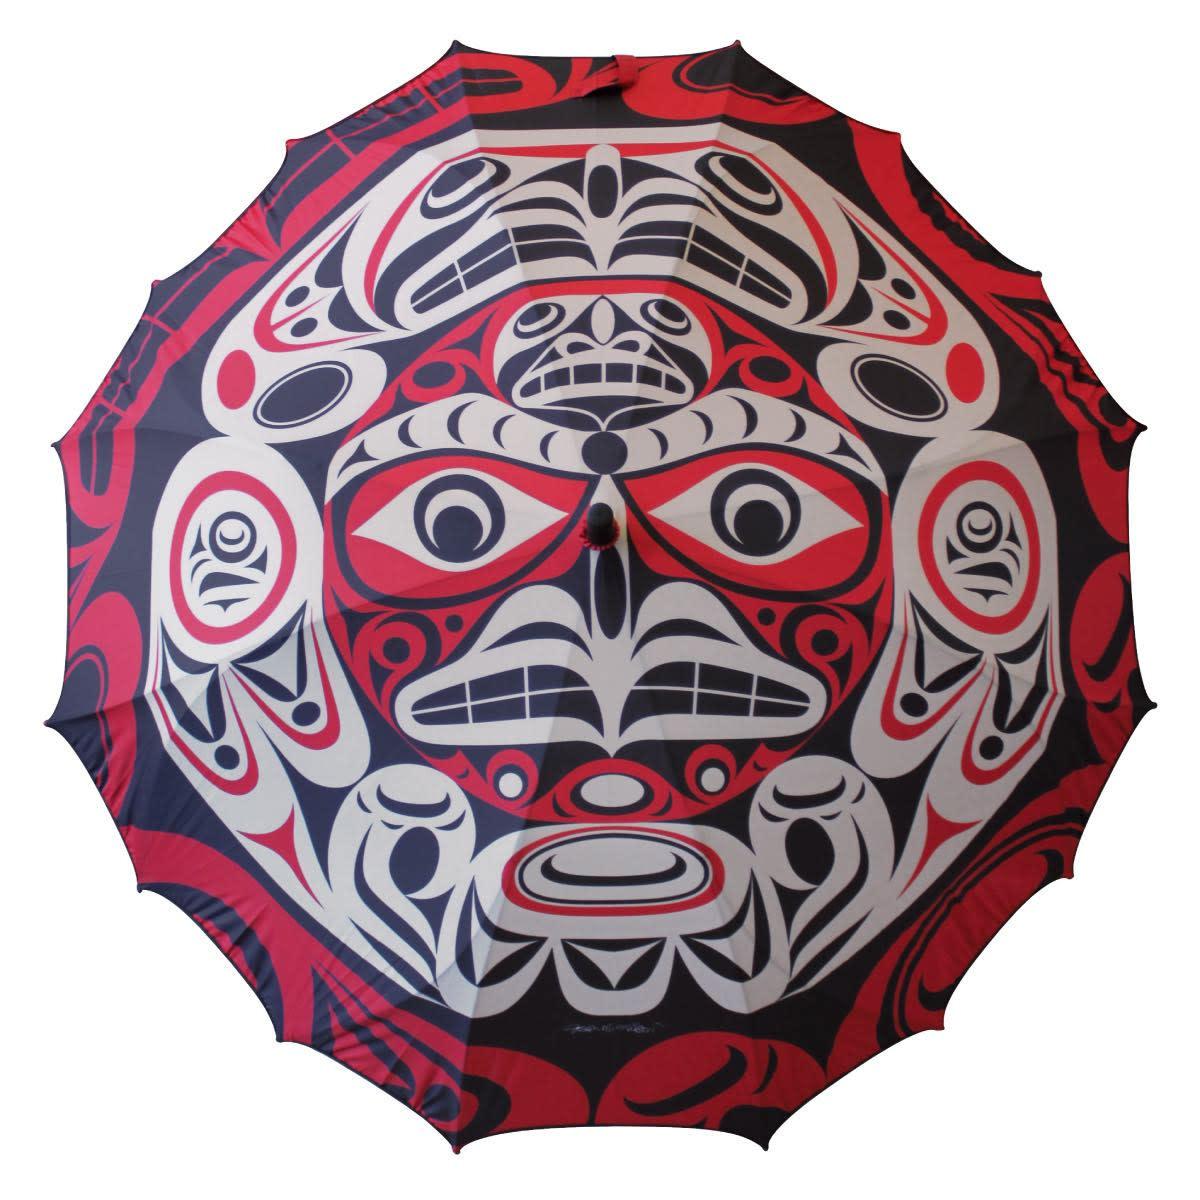 Pacific Umbrella- Thunderbird Moon by Joe Wilson-Sxwaset-1